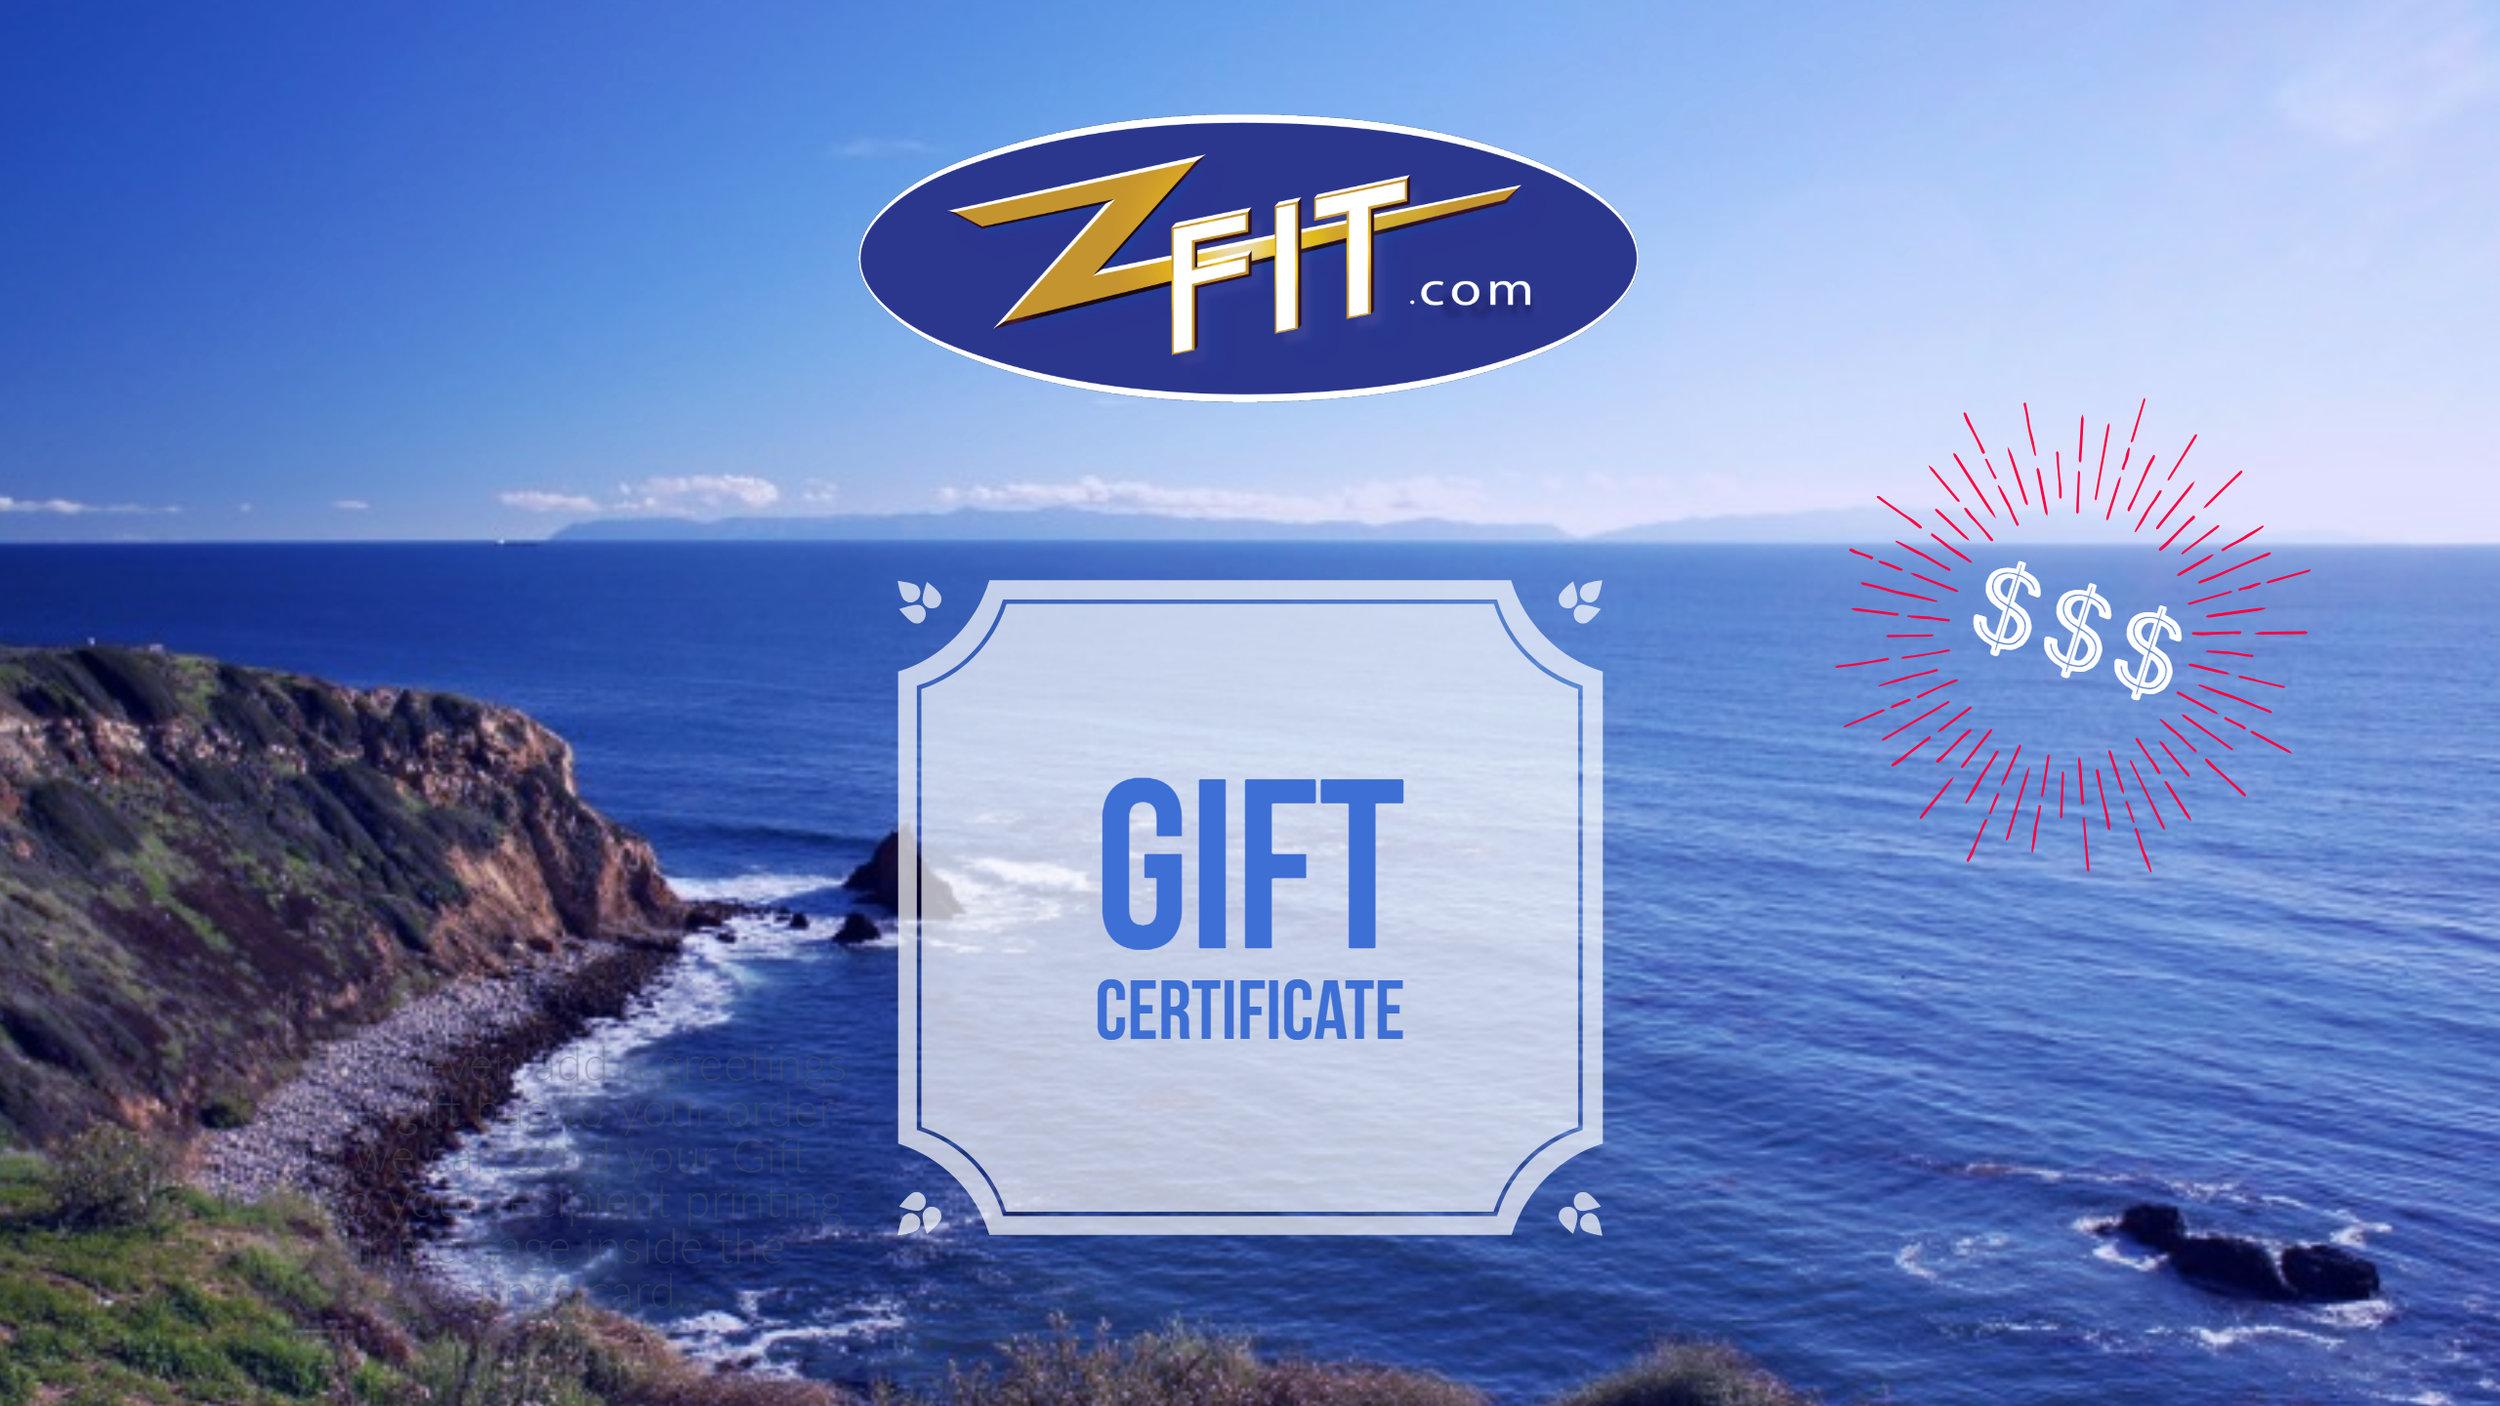 ZFIT Gift Certificate (2).jpg